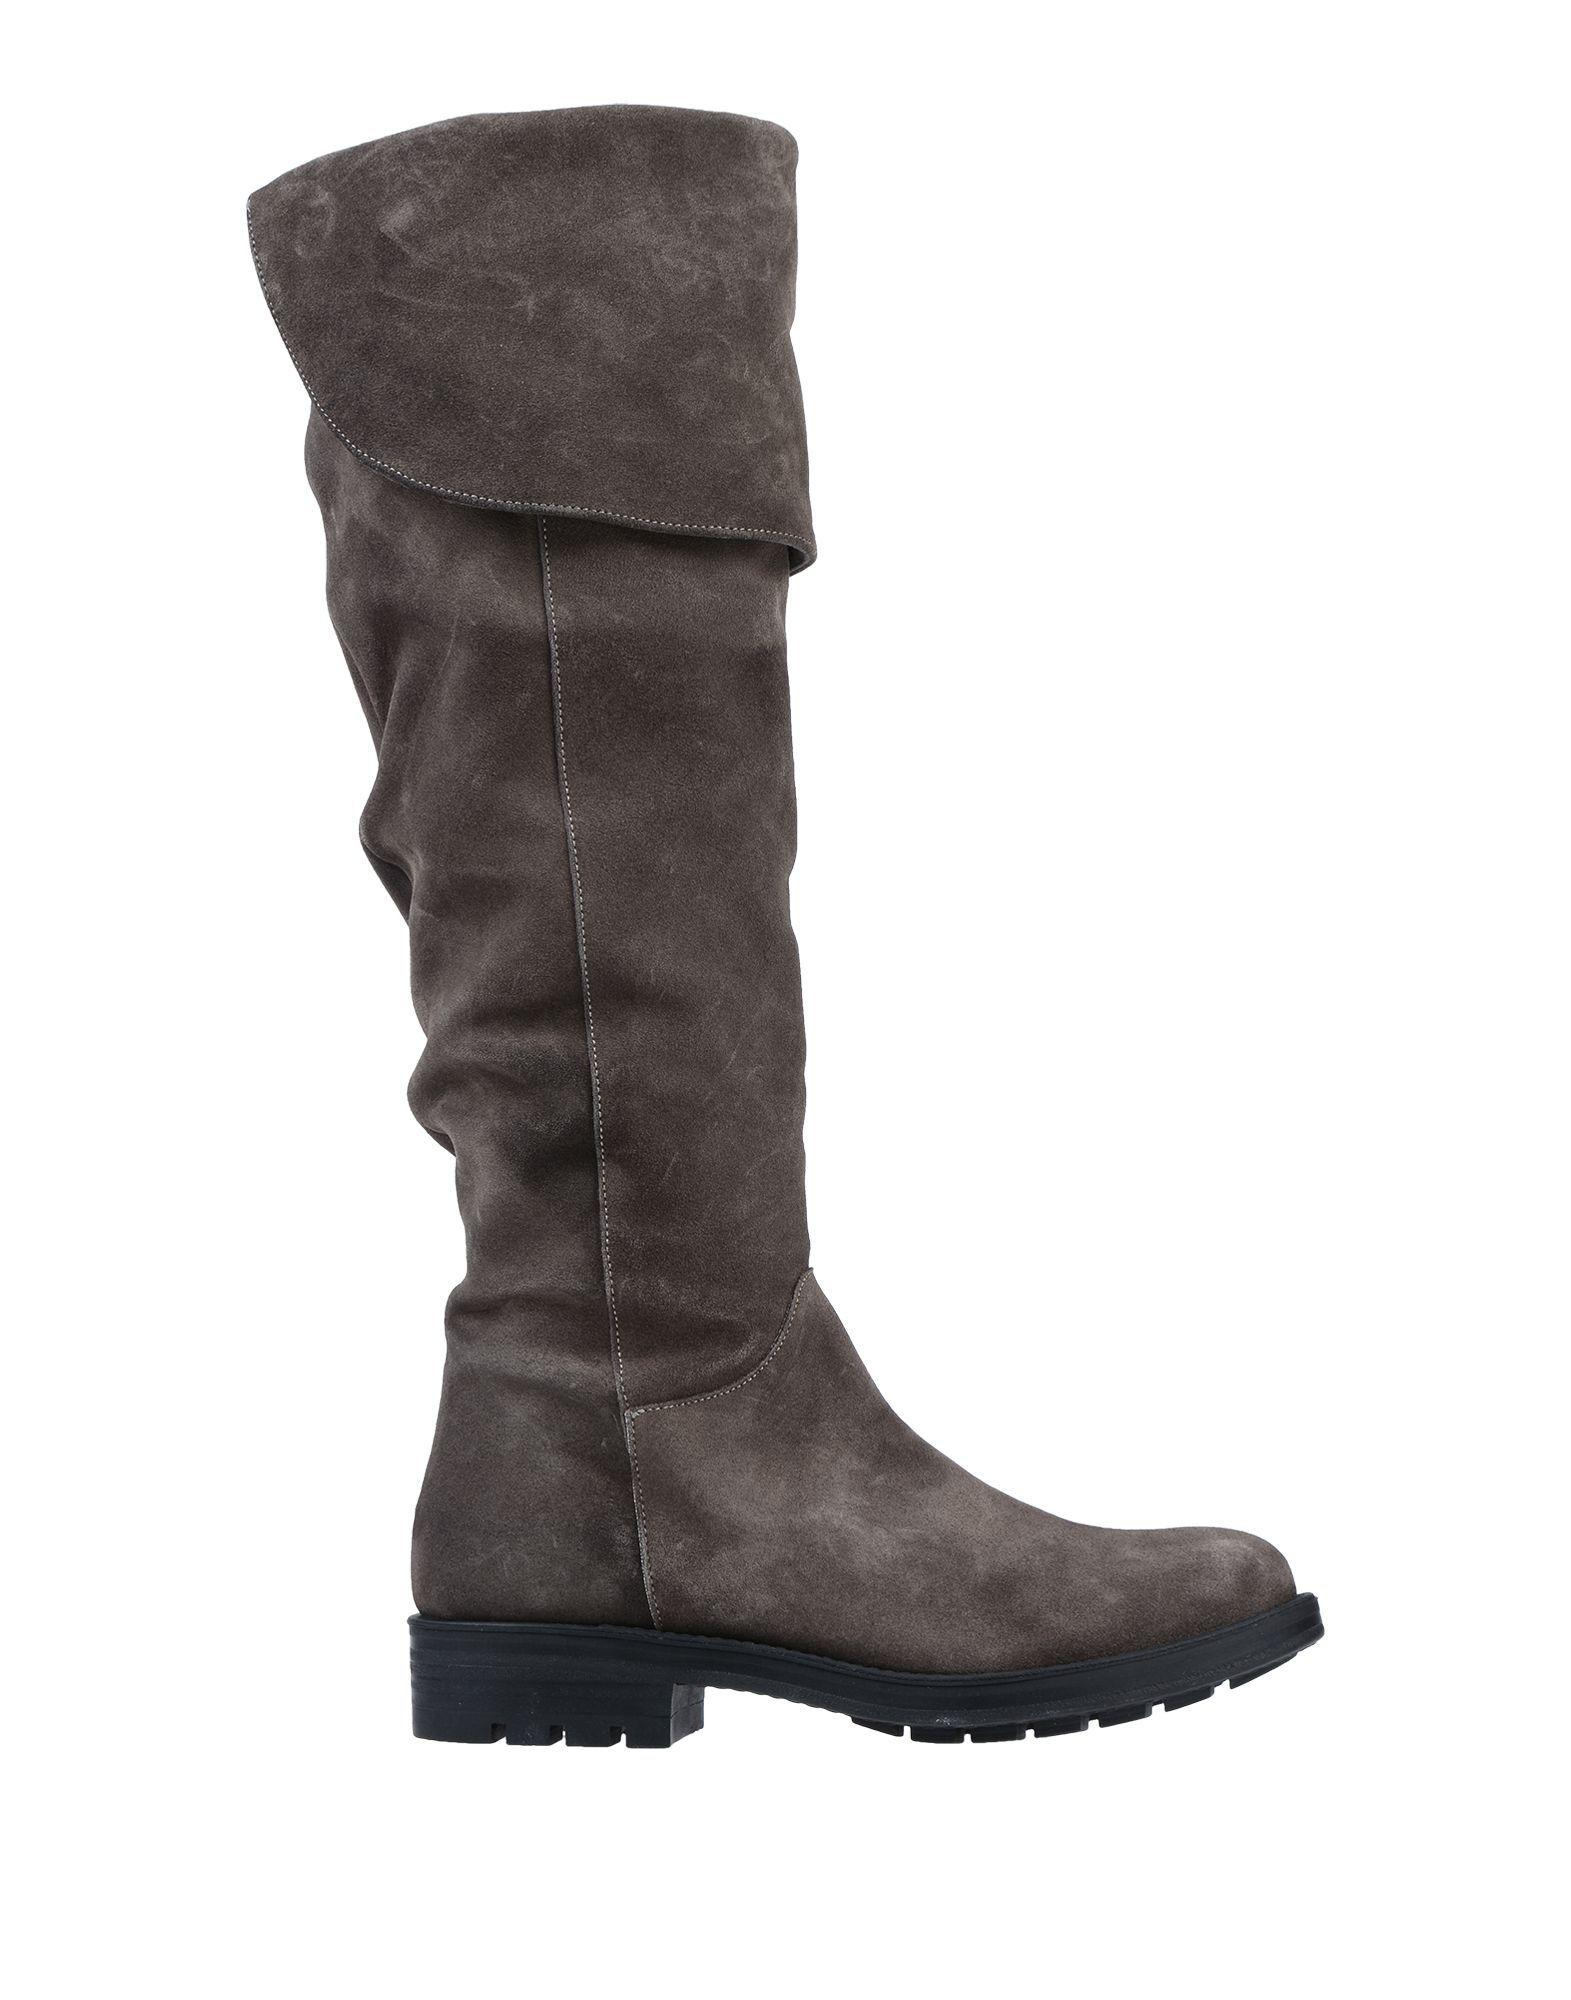 Footwear Cantarelli Lead Women's Leather